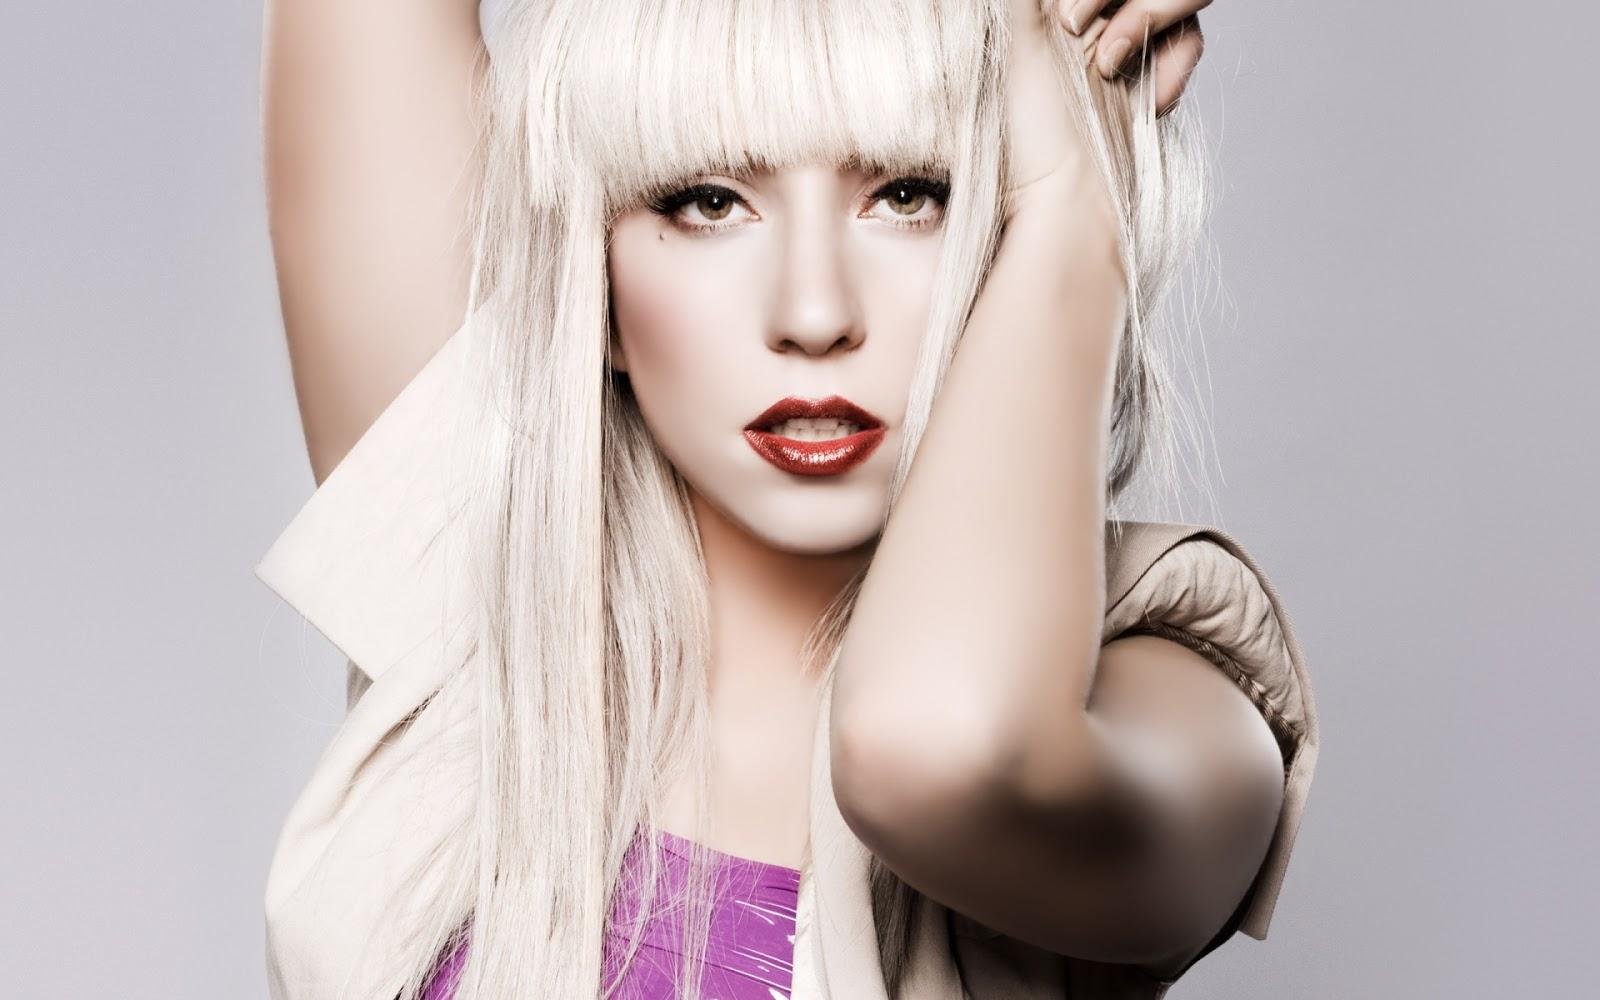 Images of Lady Gaga   1600x1000